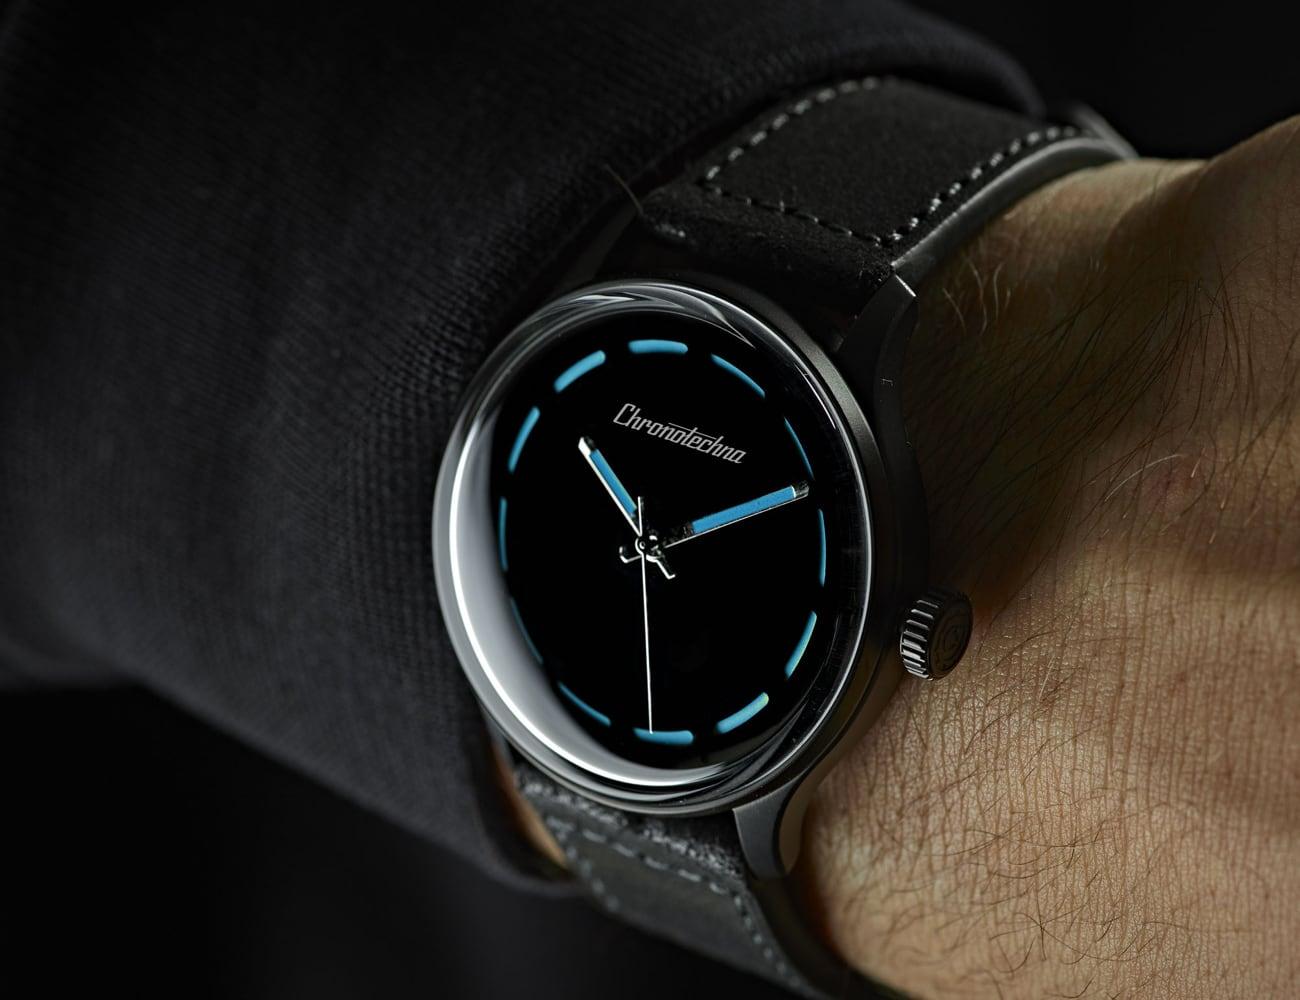 The Blackest Swiss Made Self-Winding Watch